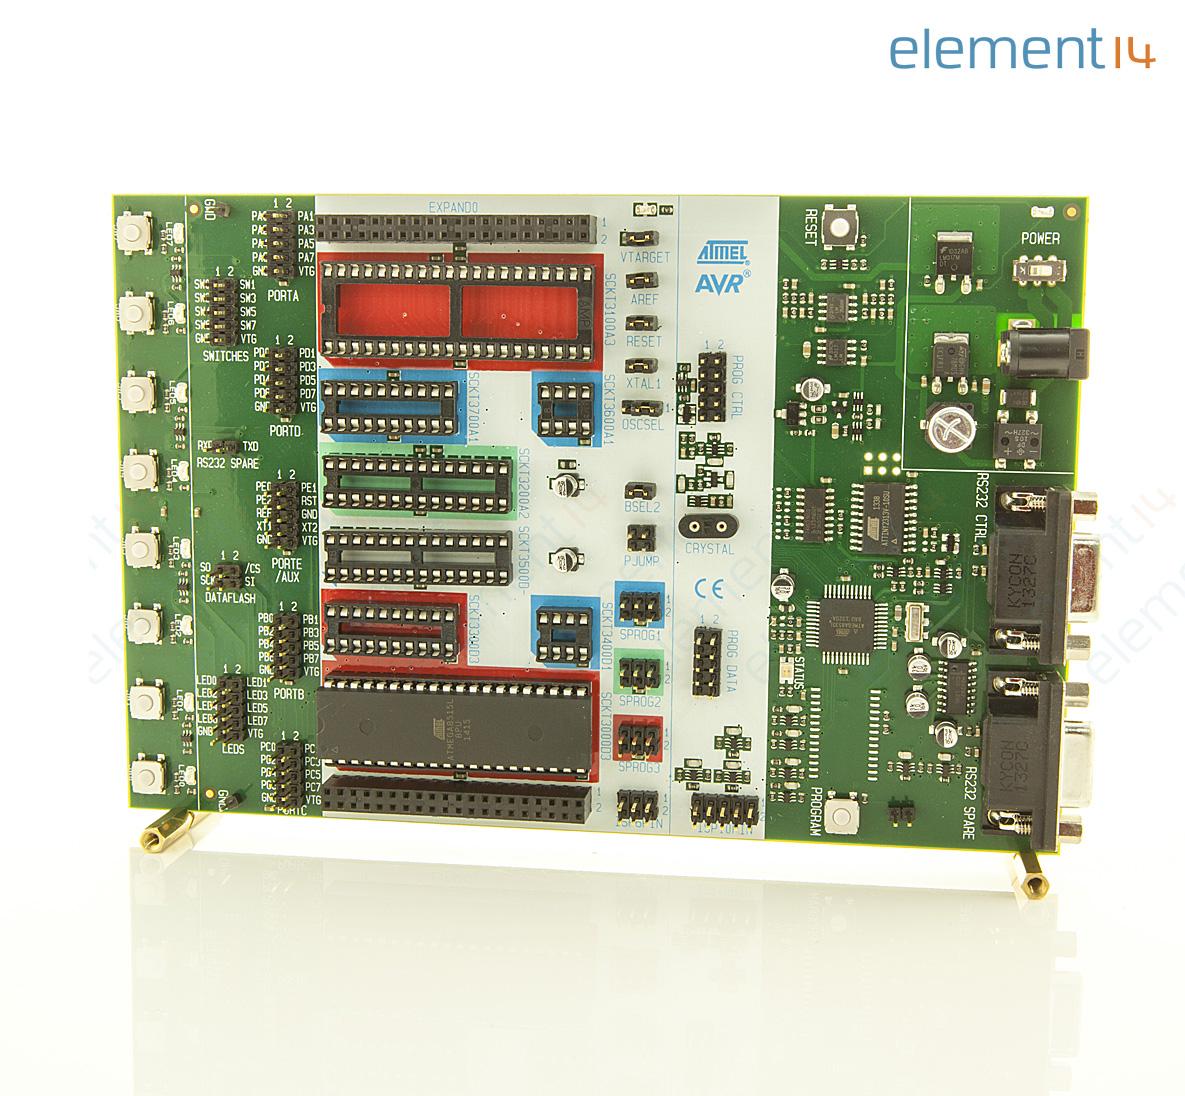 Atstk500 Microchip Development Kit Avr Flash Mcus Rs232 Atmel Mcu Family Expanded